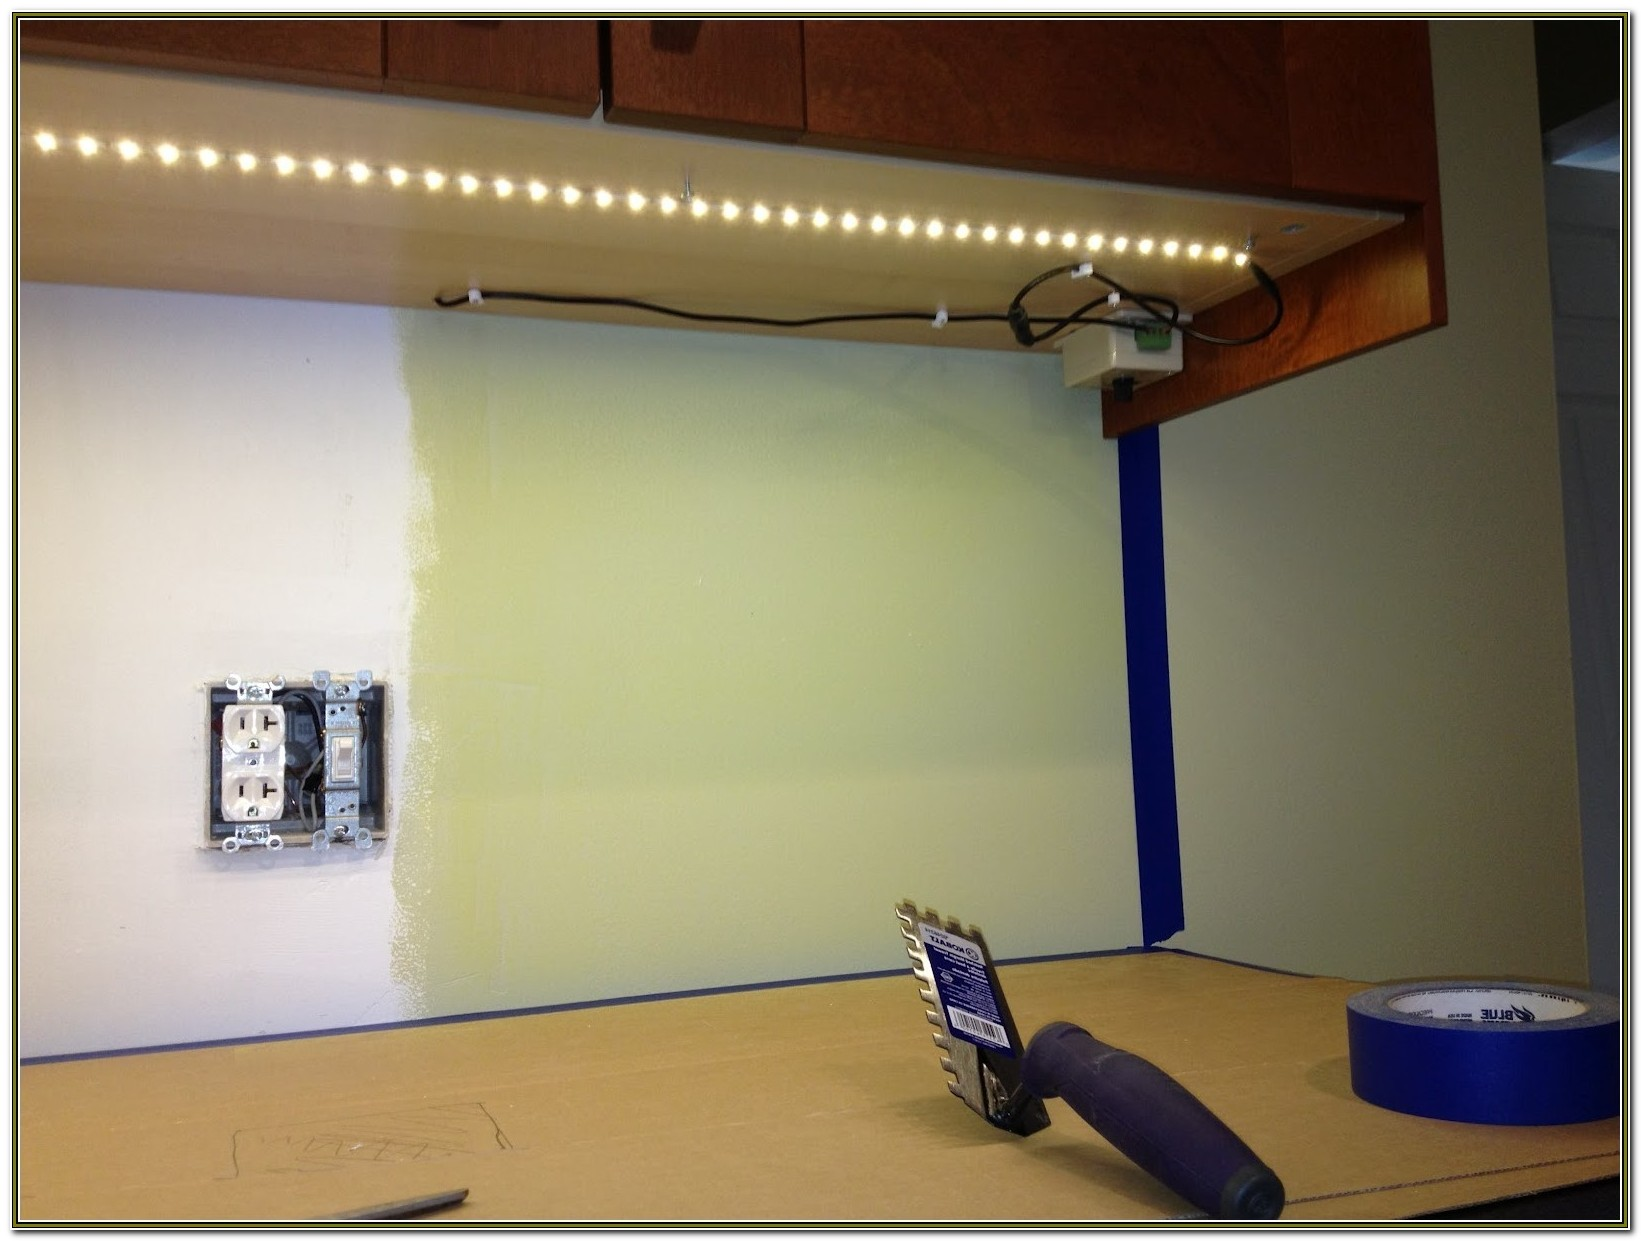 Hardwired Under Cabinet Led Puck Lighting